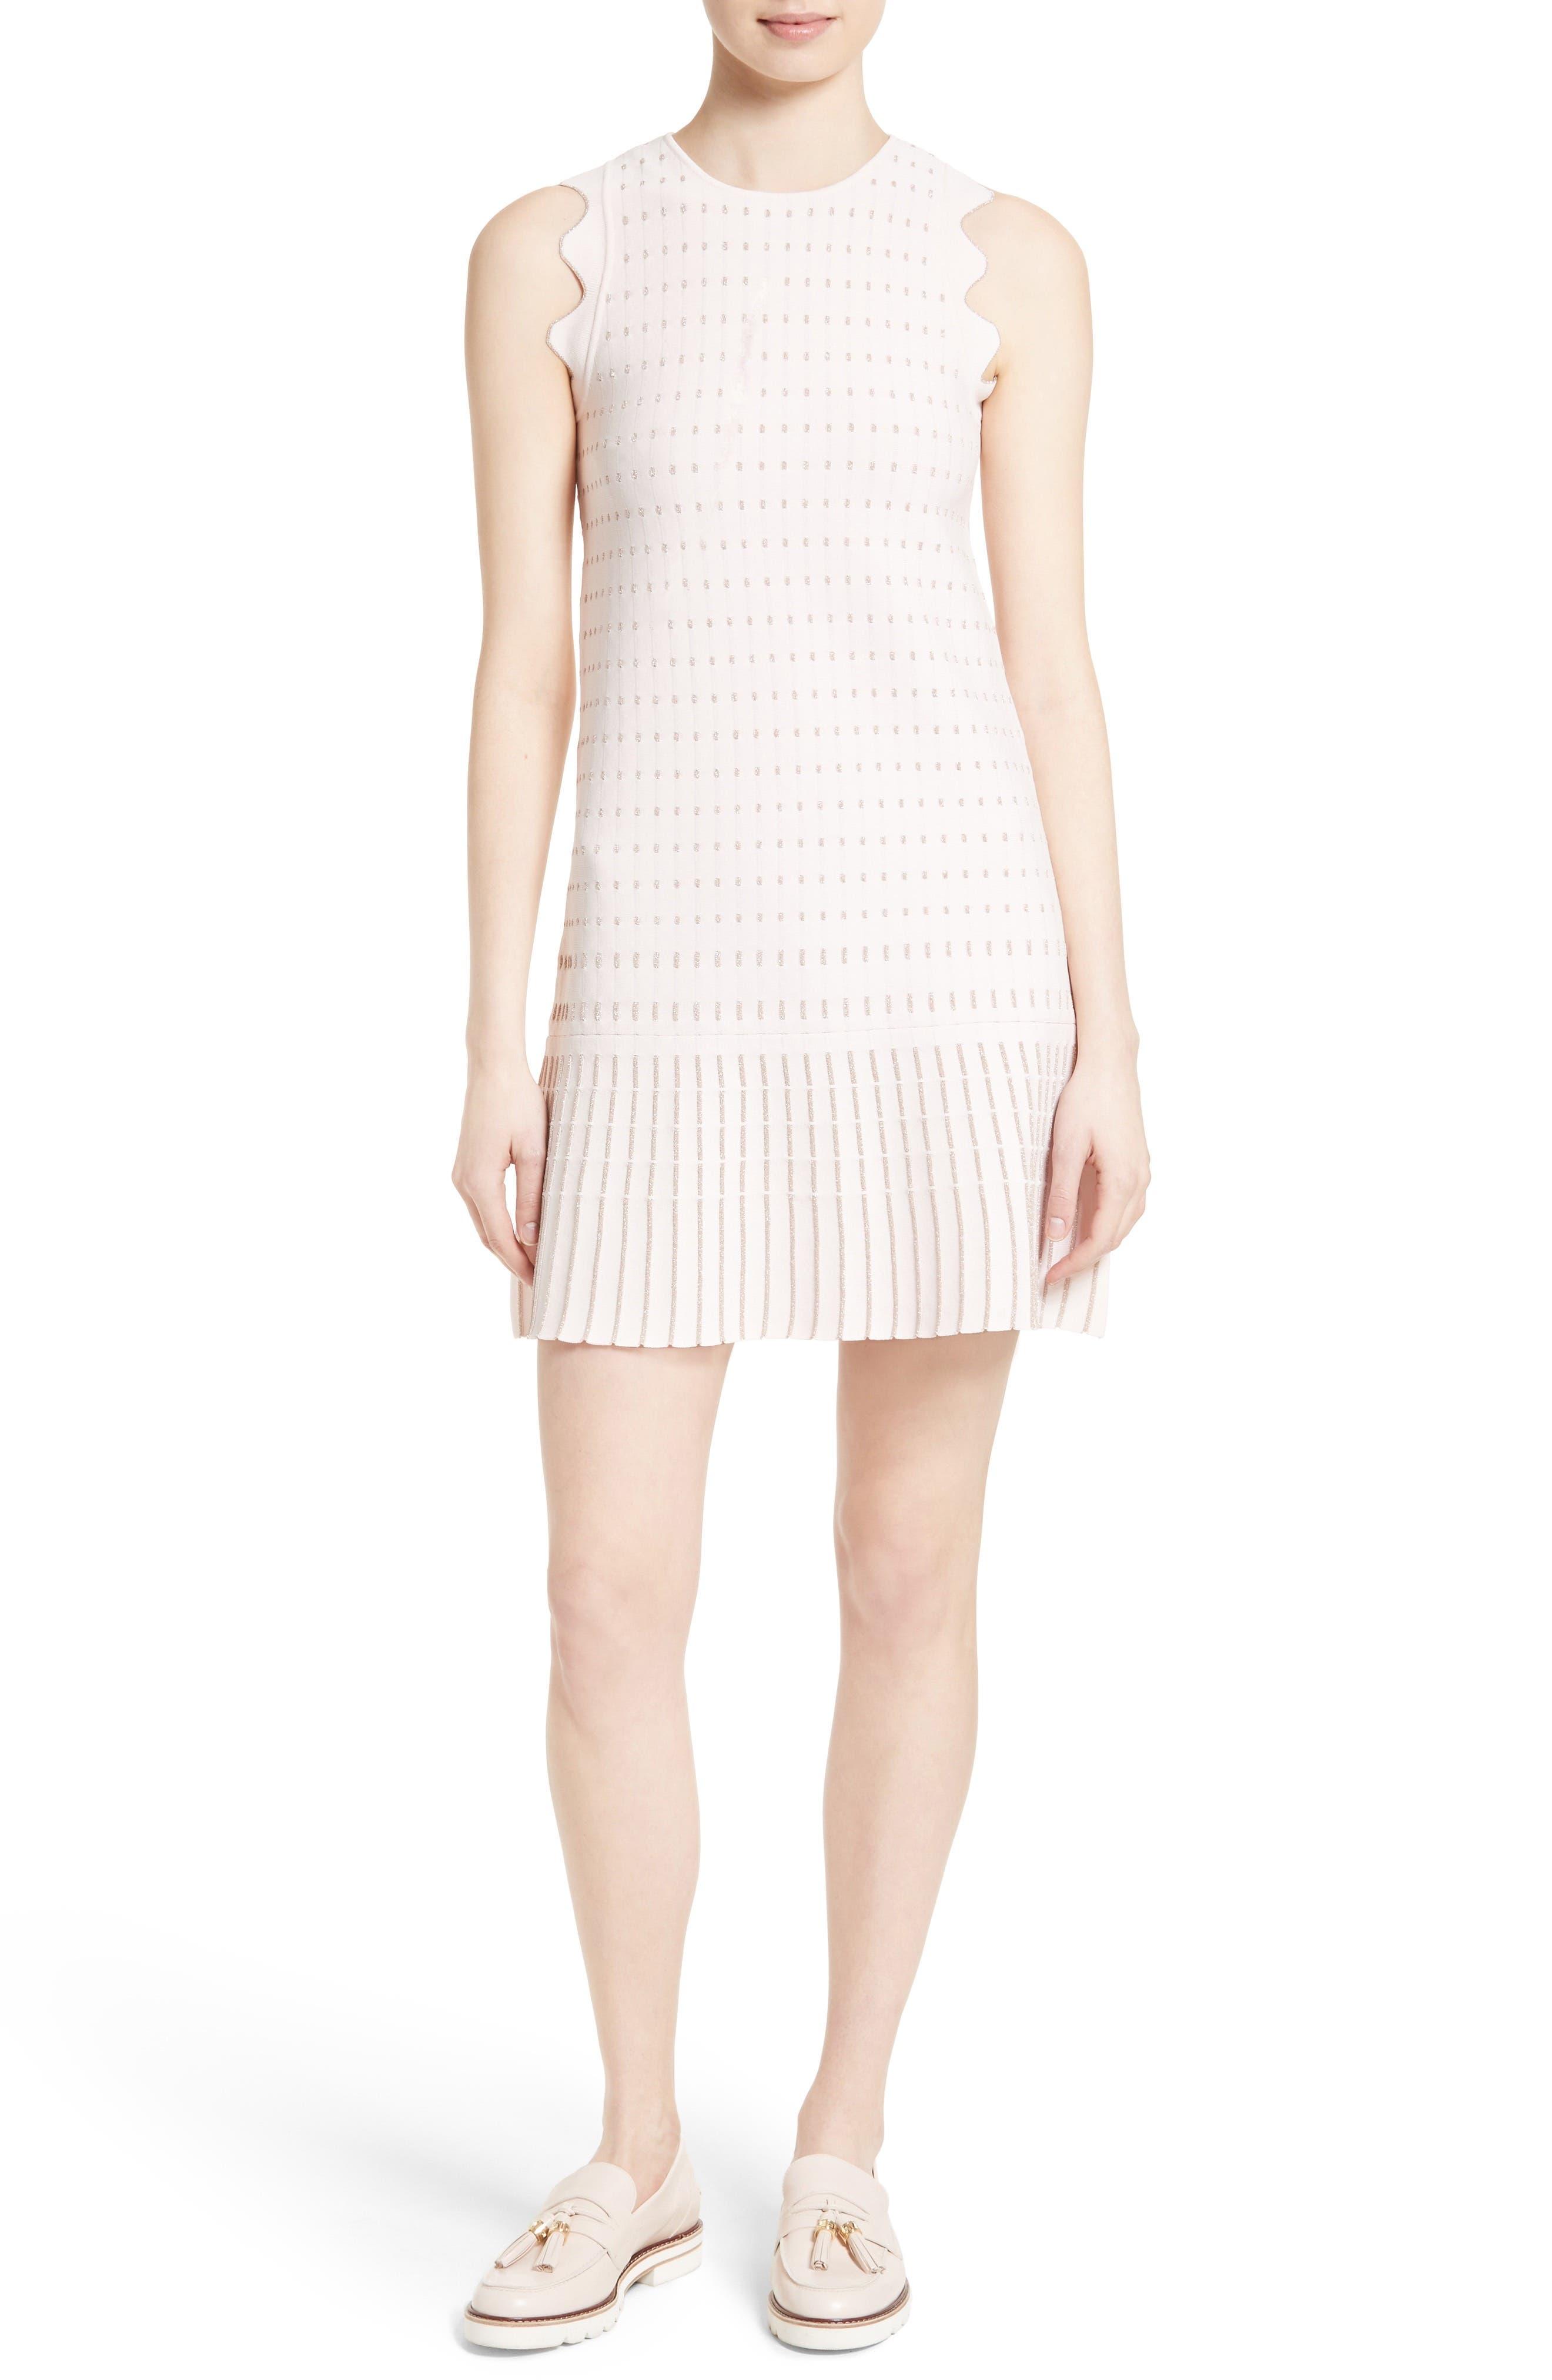 Ted Baker London Relioa Metallic Jacquard Knit Dress